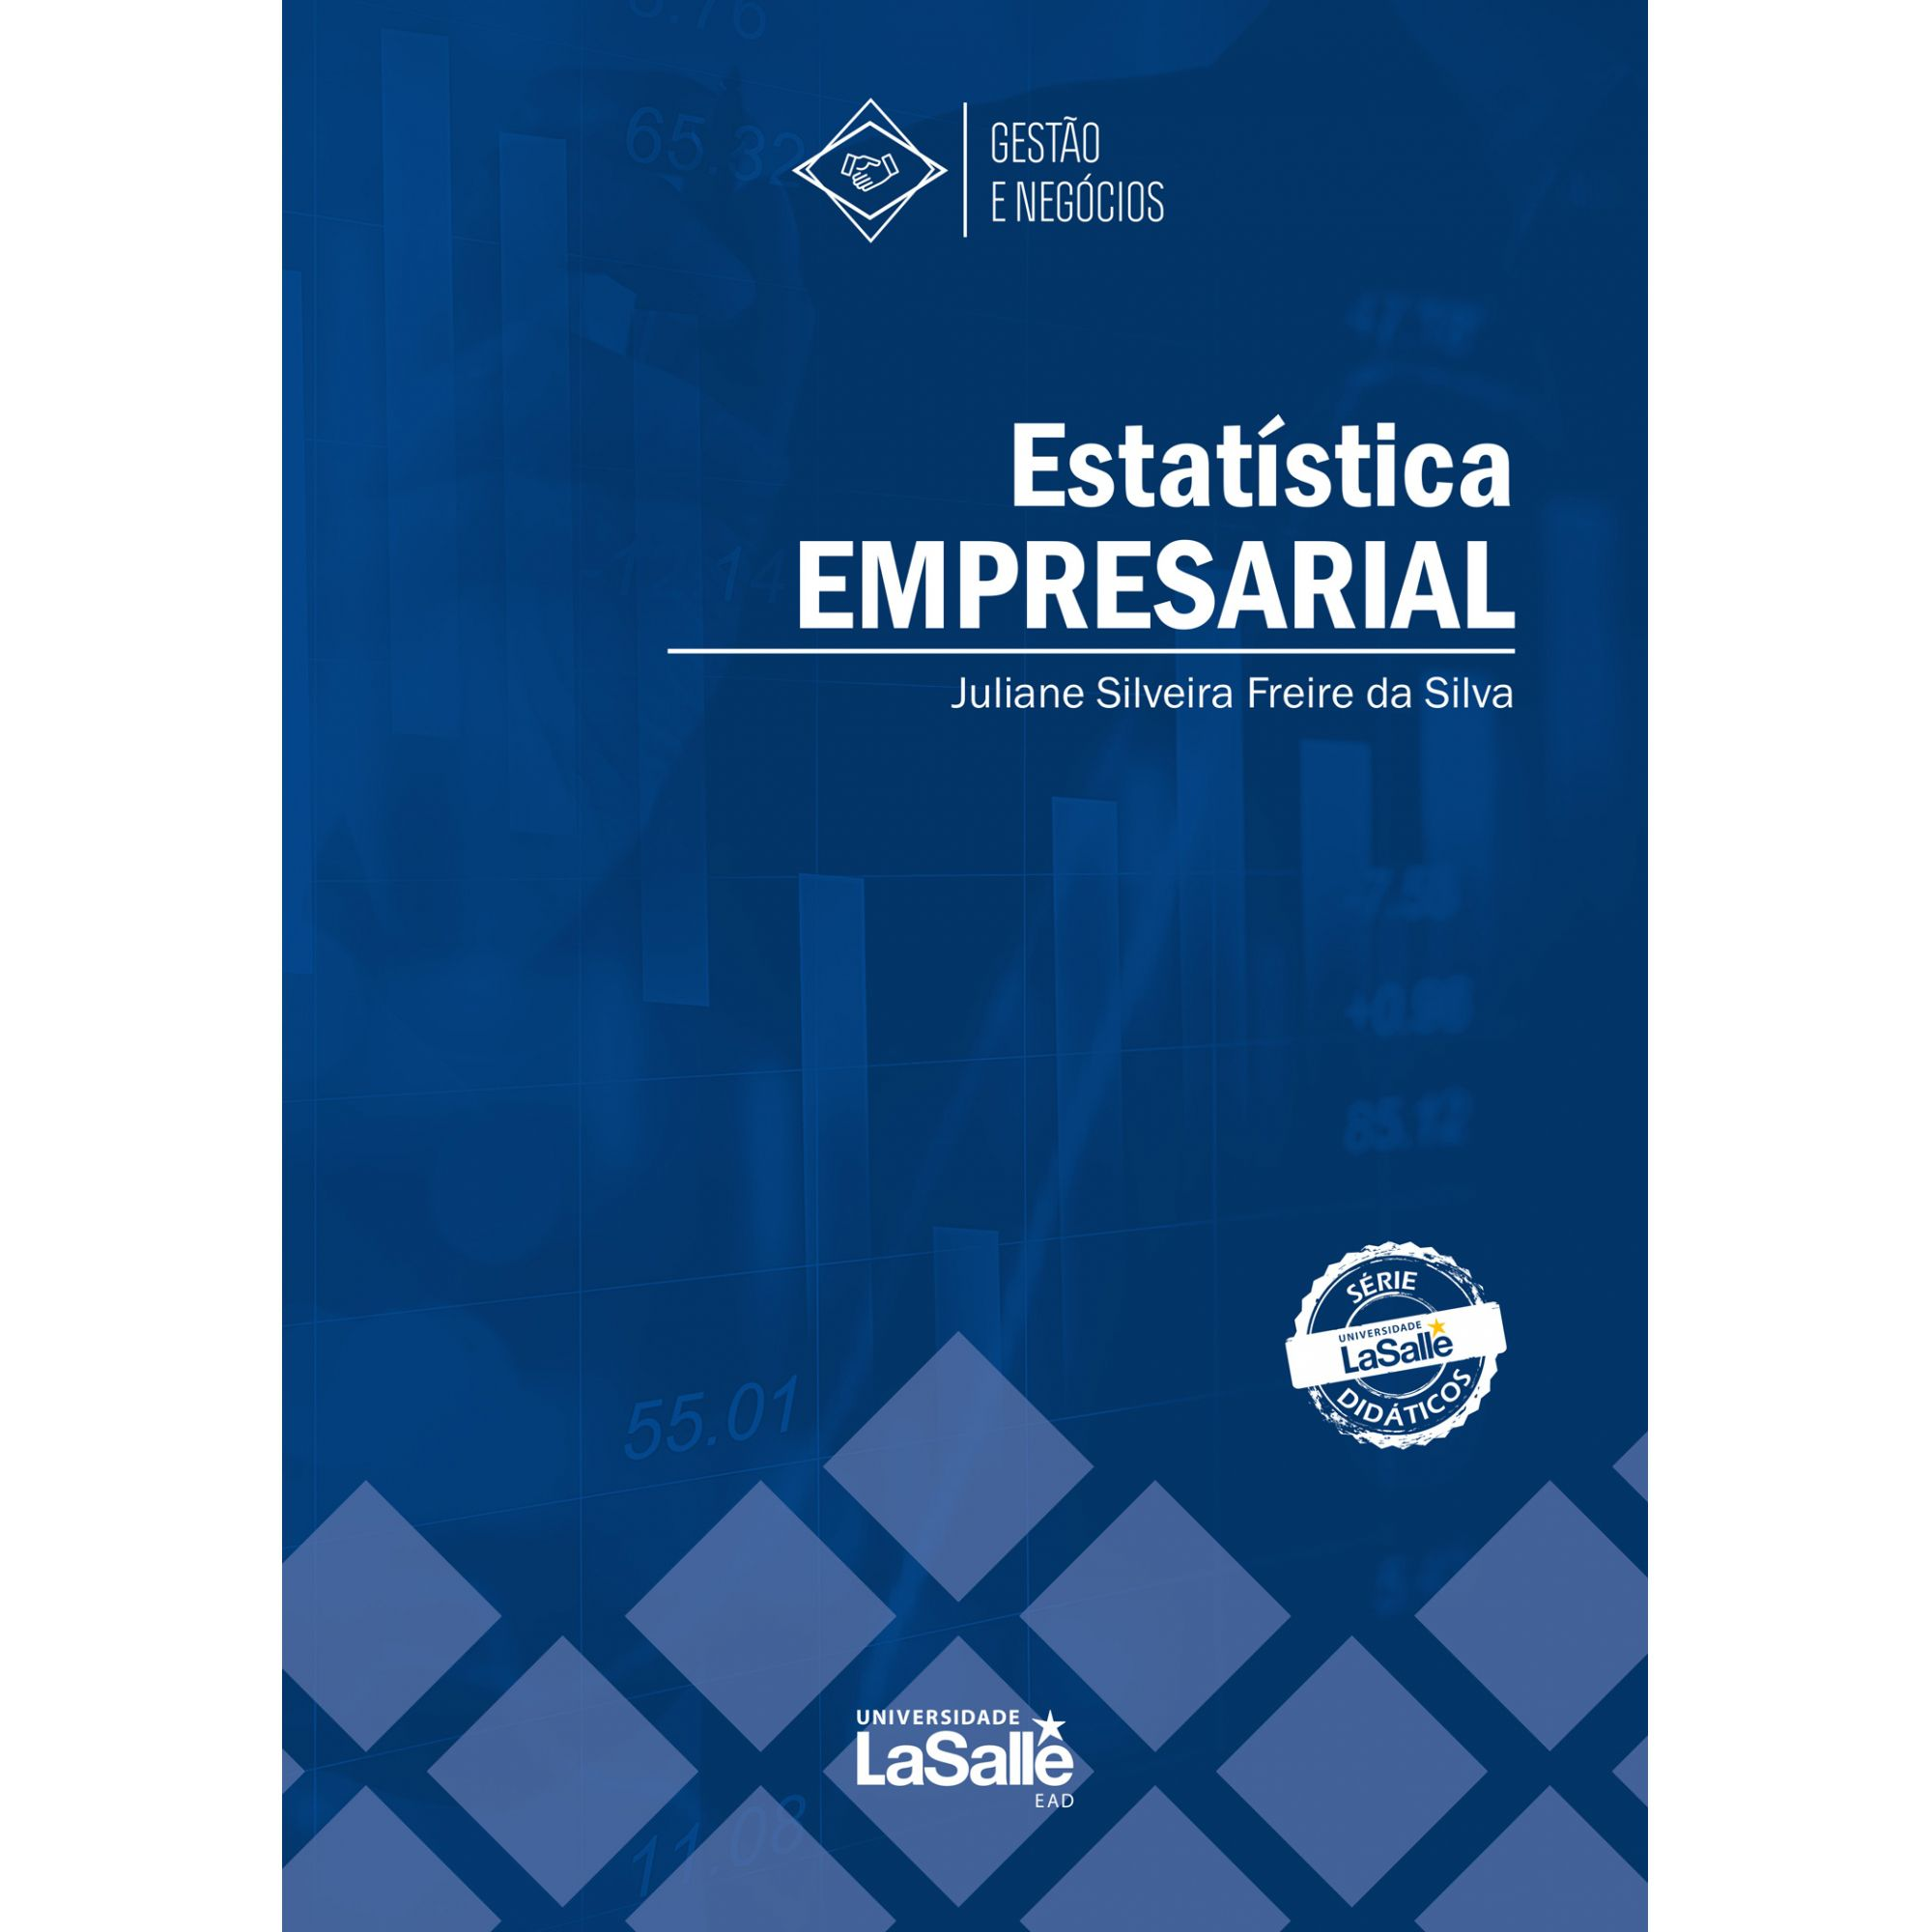 Estatística Empresarial